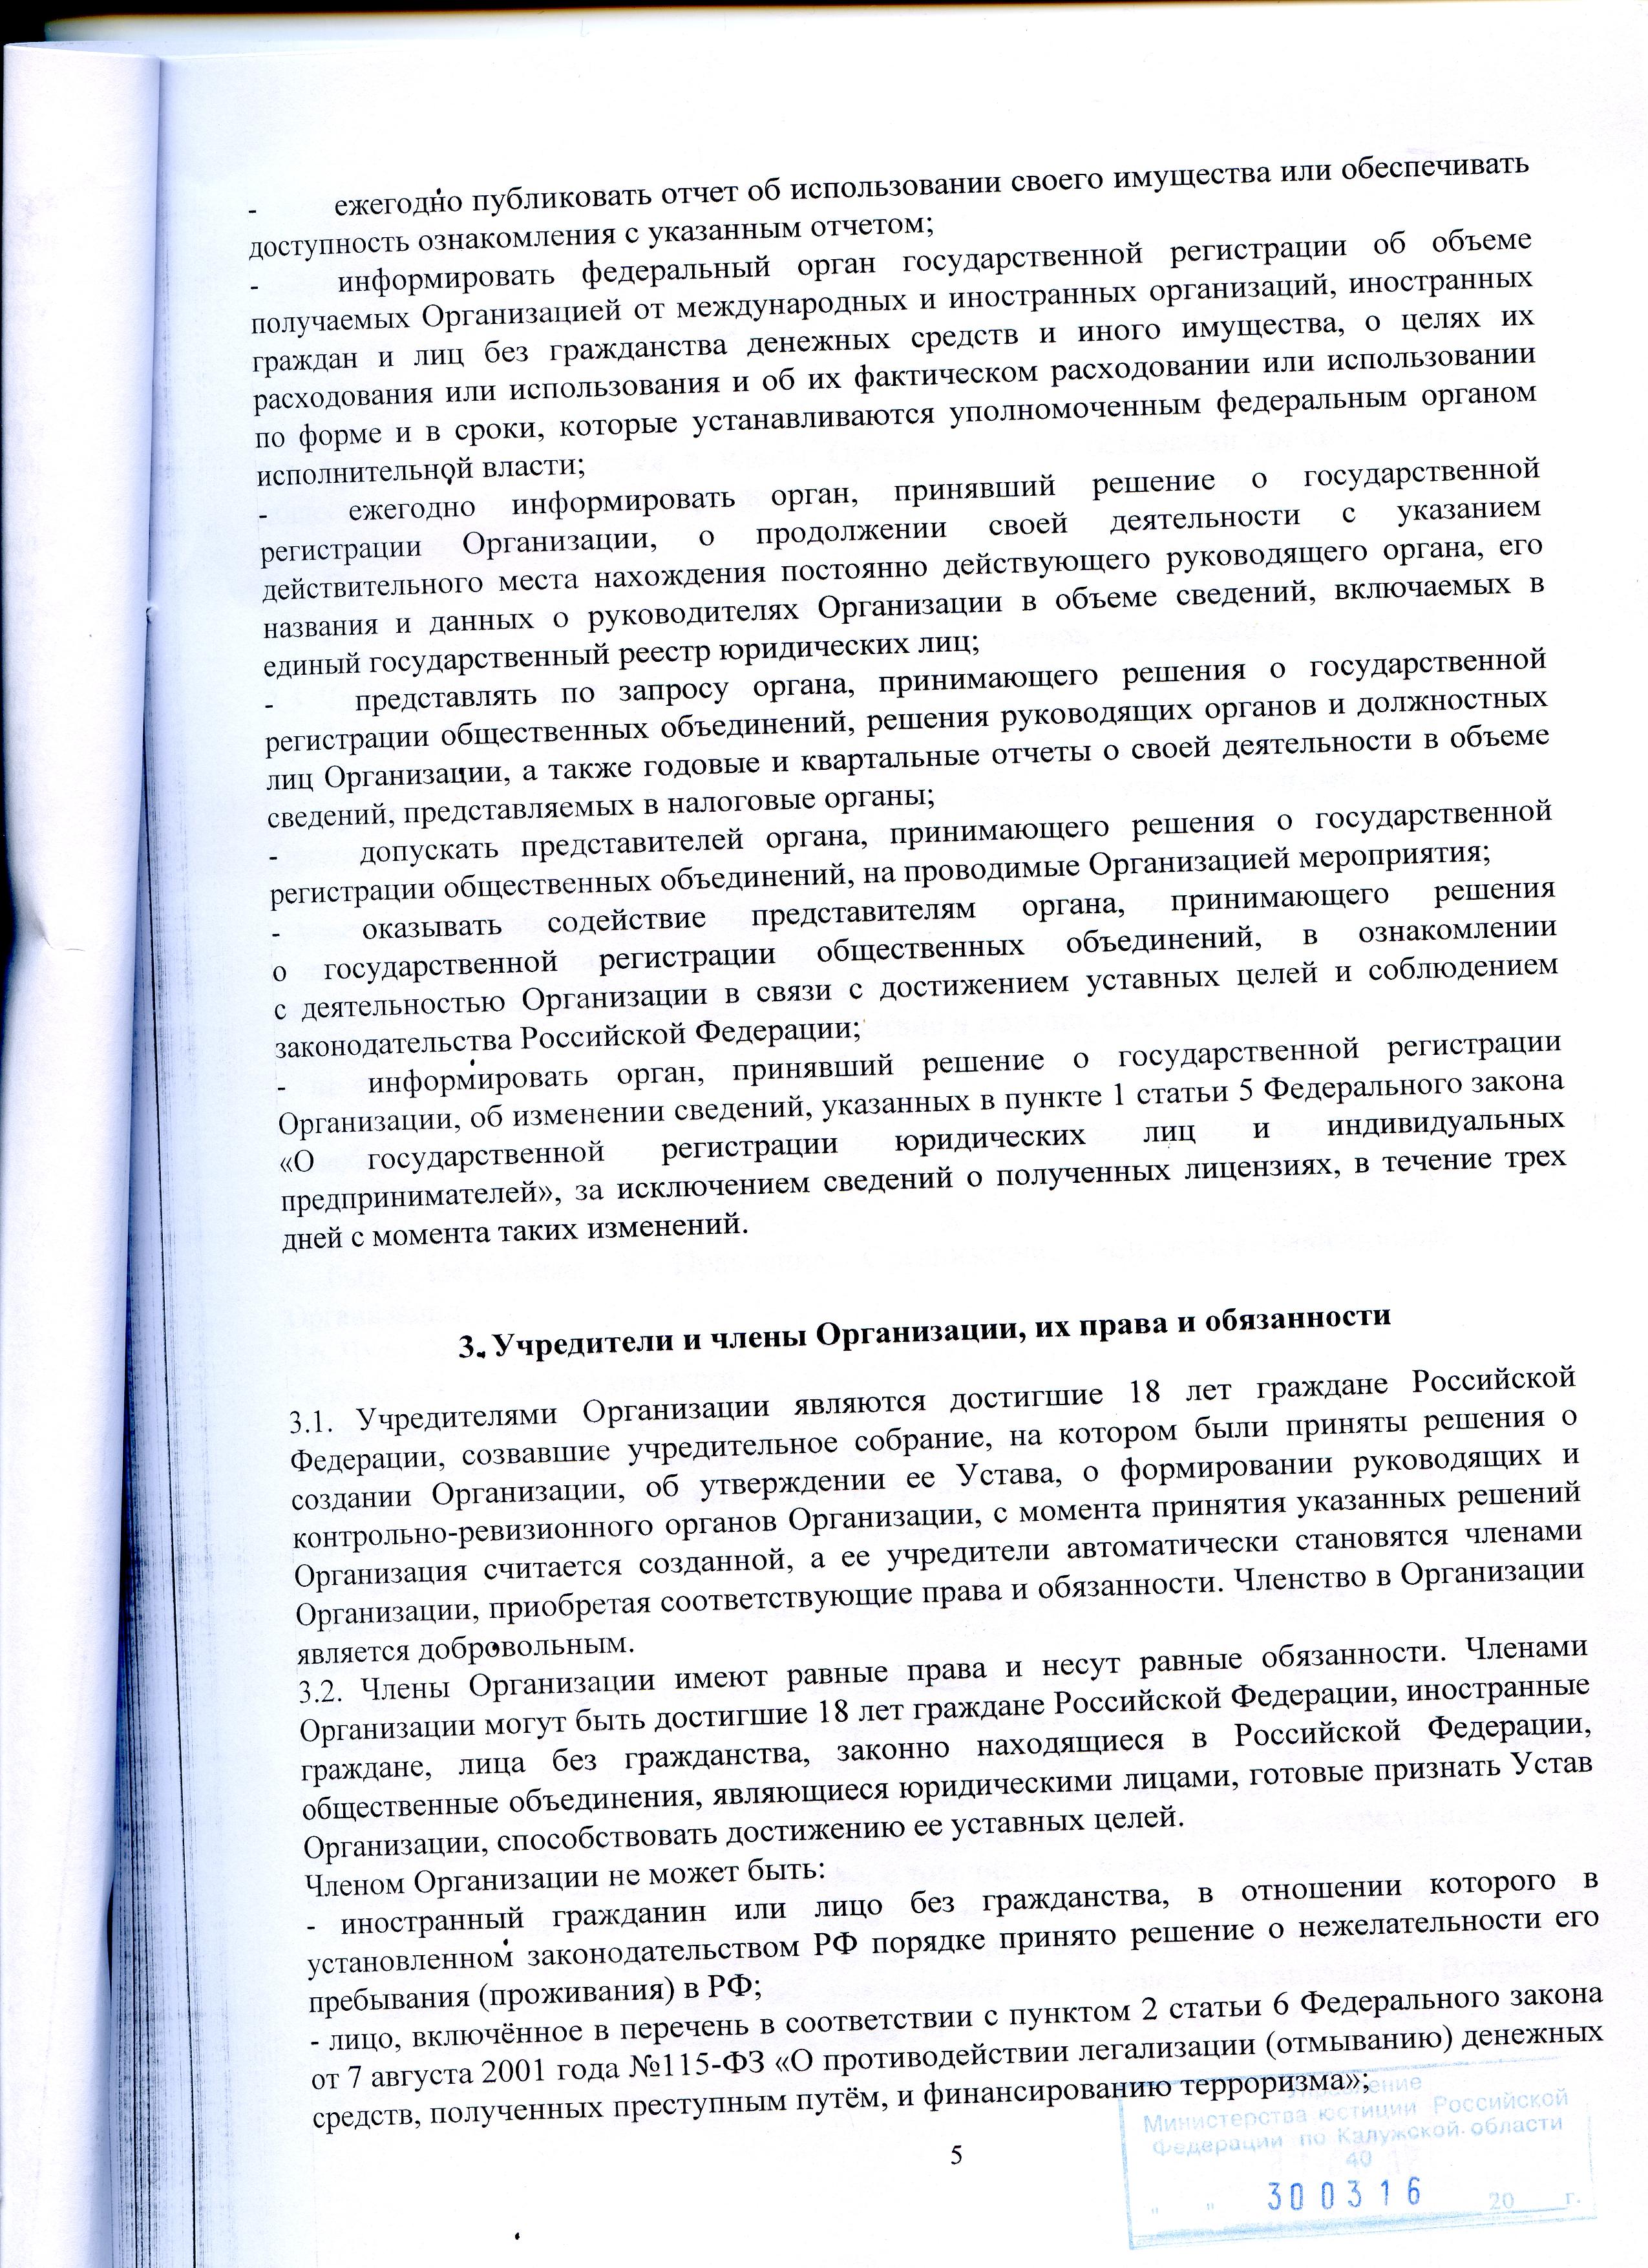 Устав НД 2 редакция066